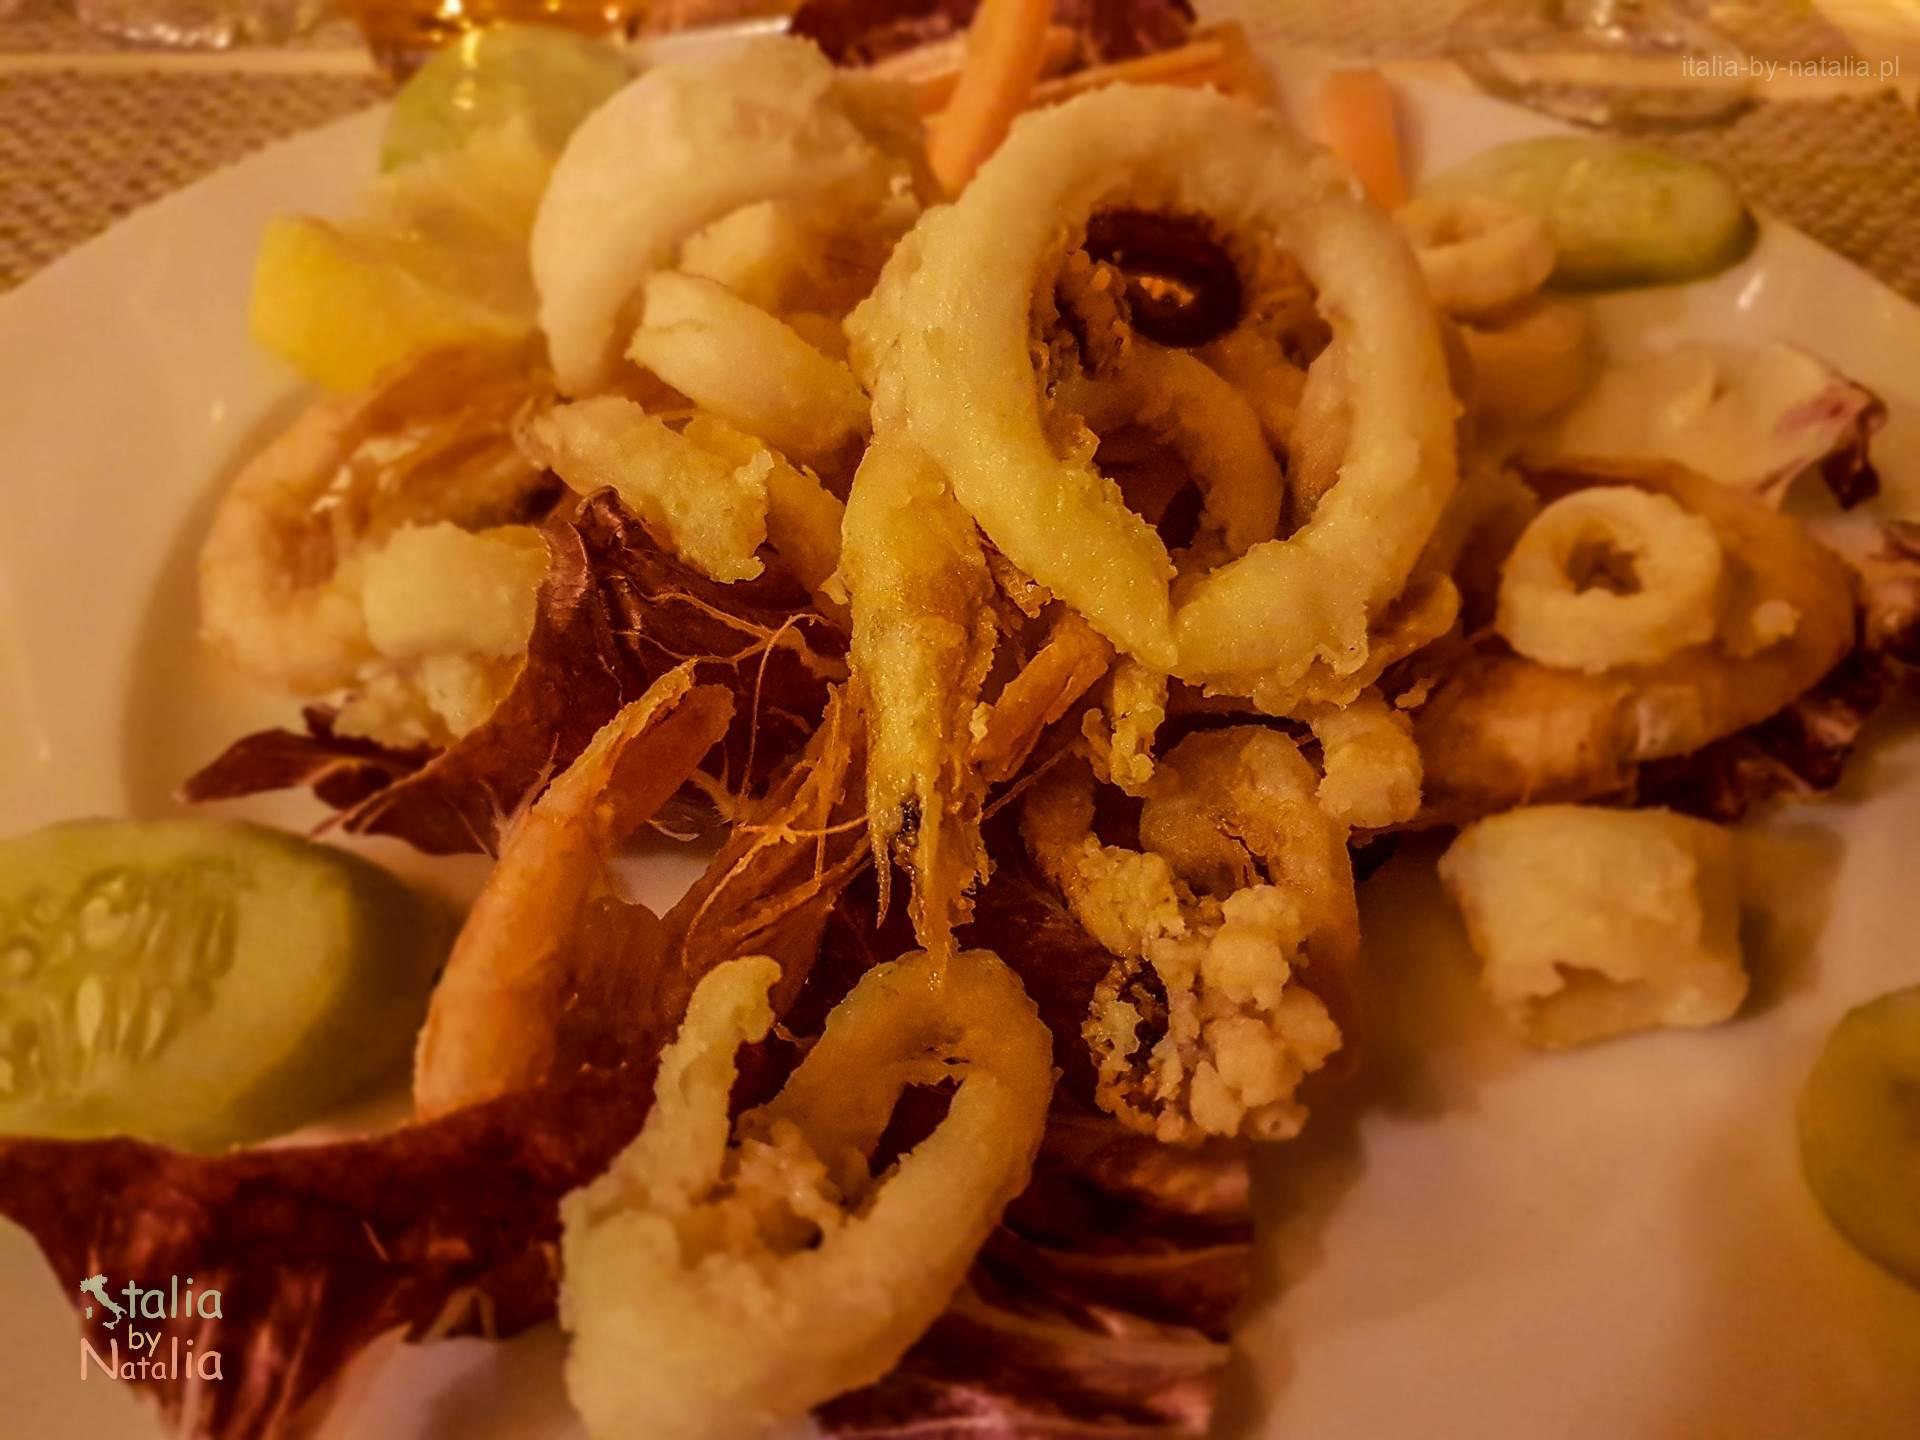 Bari sprawdzona restauracja owoce morza